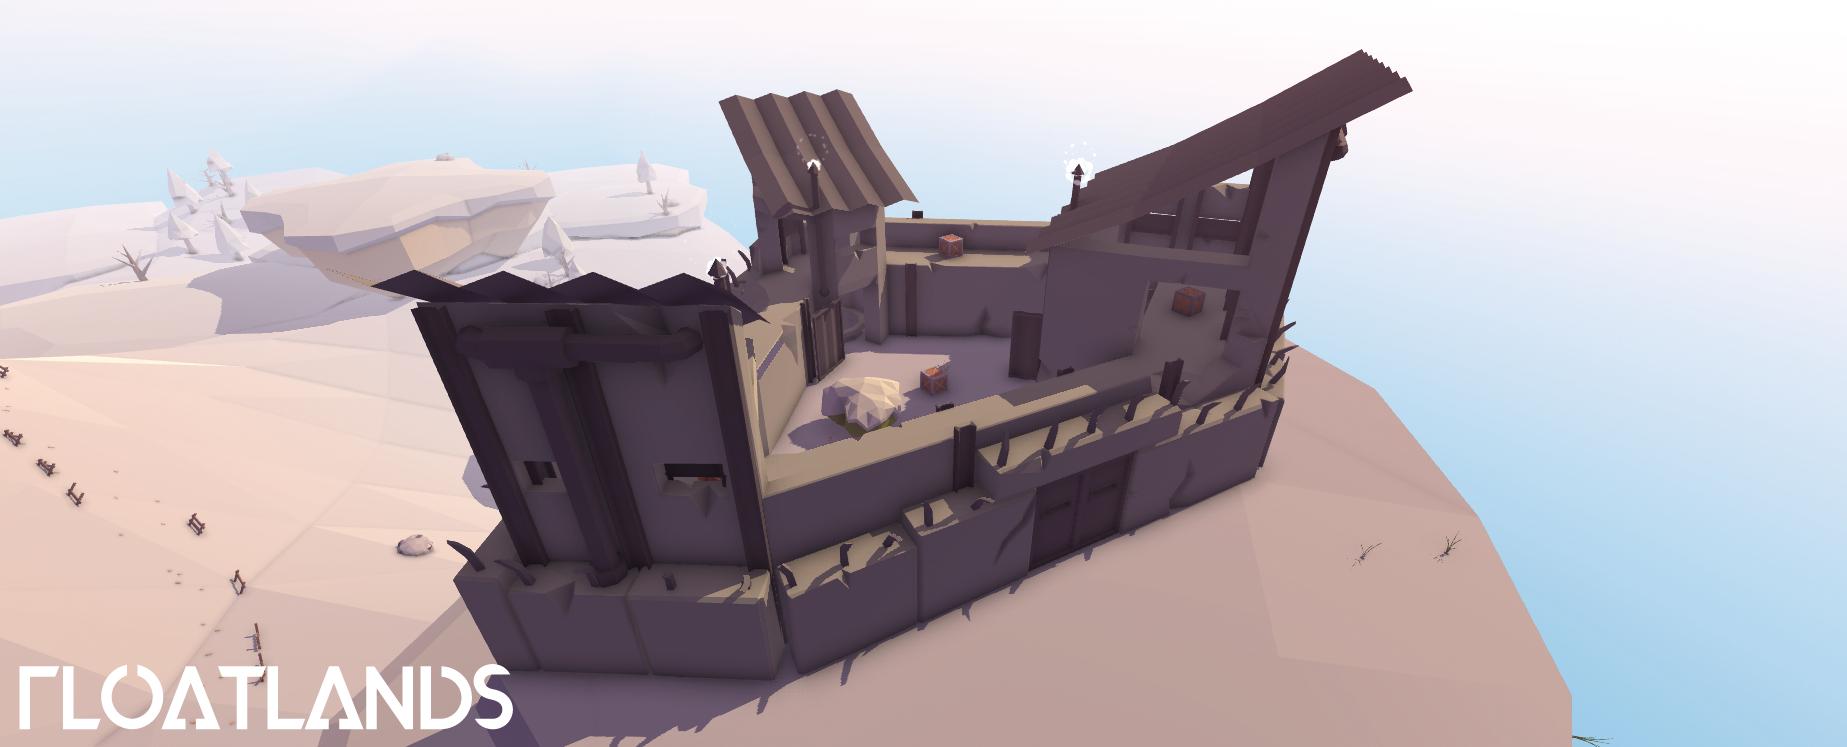 fortress-winter-floatlands.png